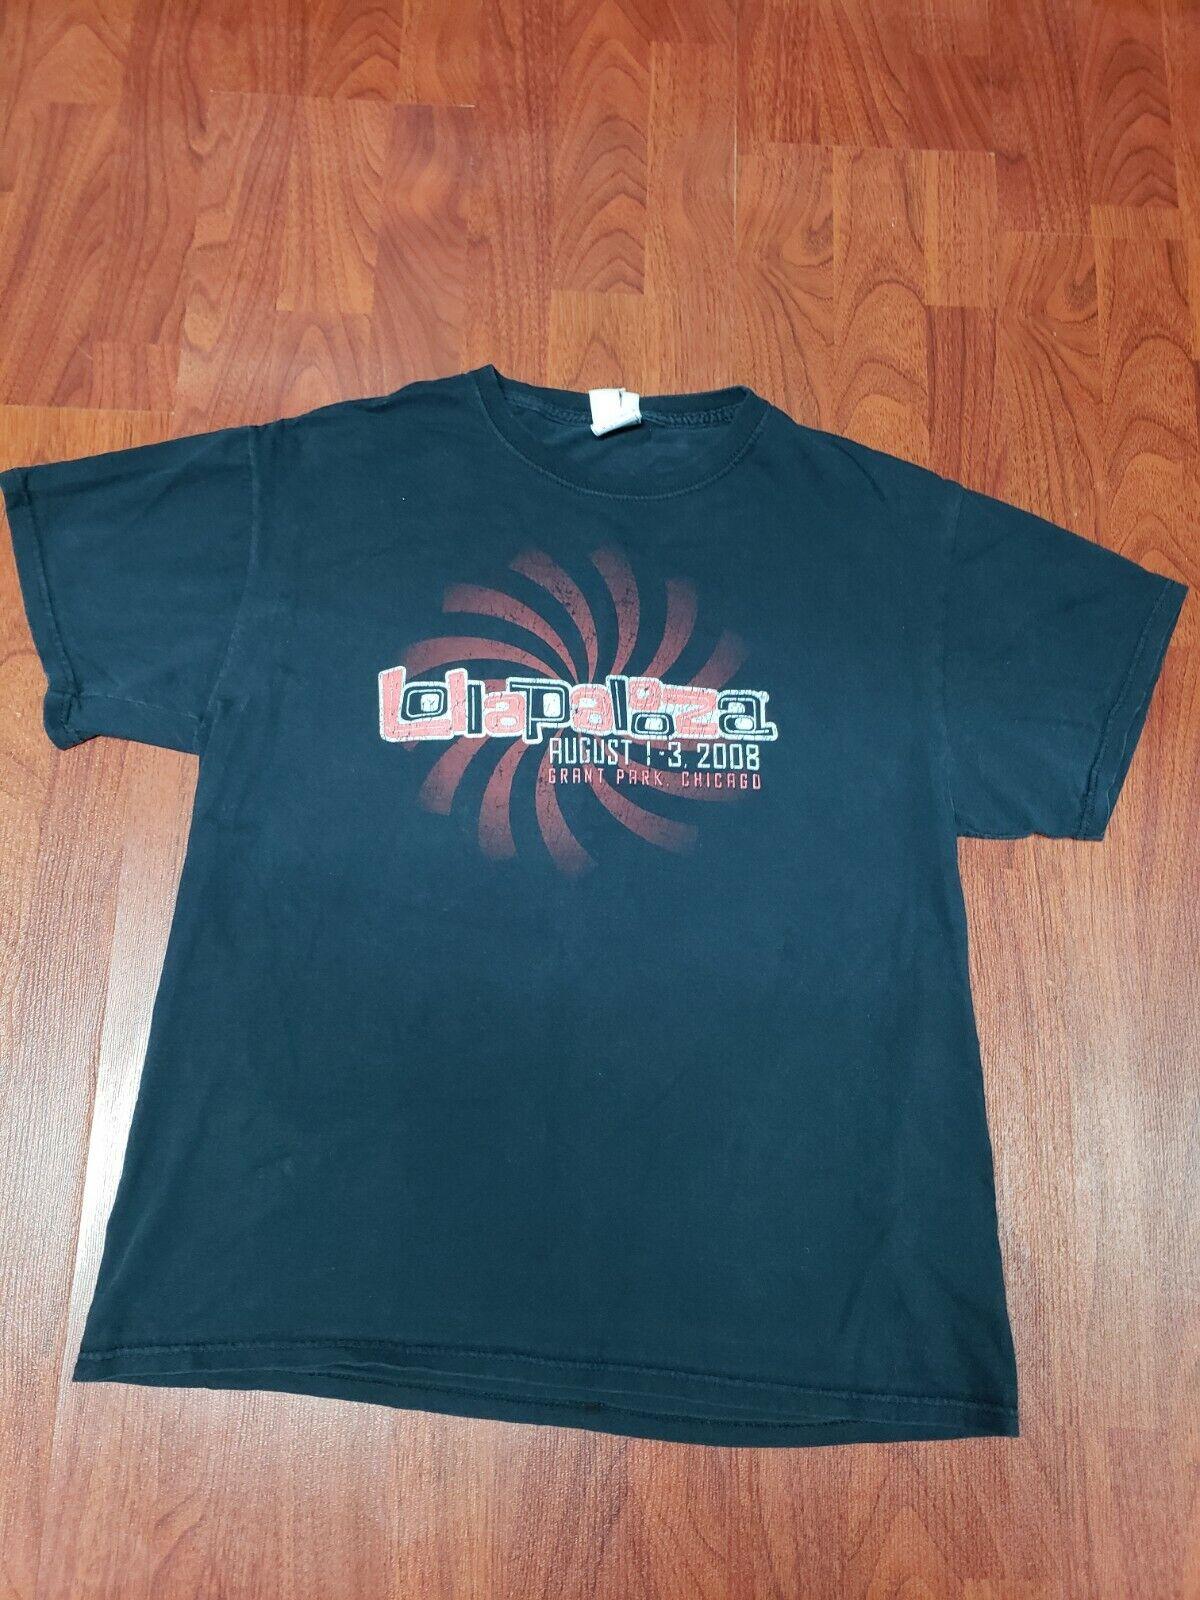 Lollapalooza T-Shirt 2008 Radiohead Rage Against … - image 2